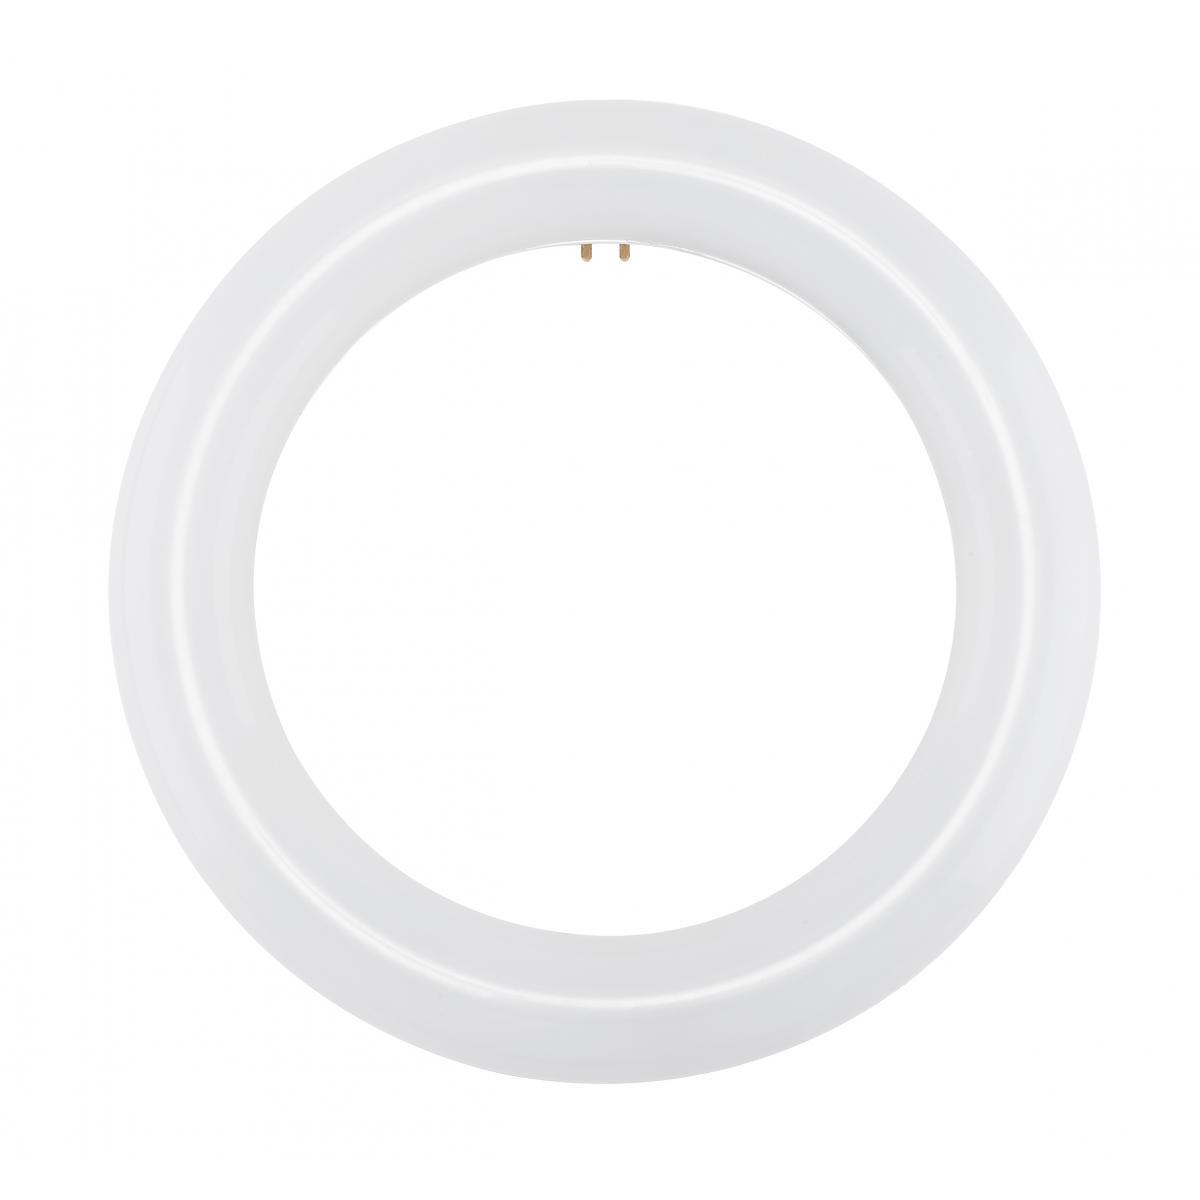 S16501 FC8T9/LED/CIR/840/BP